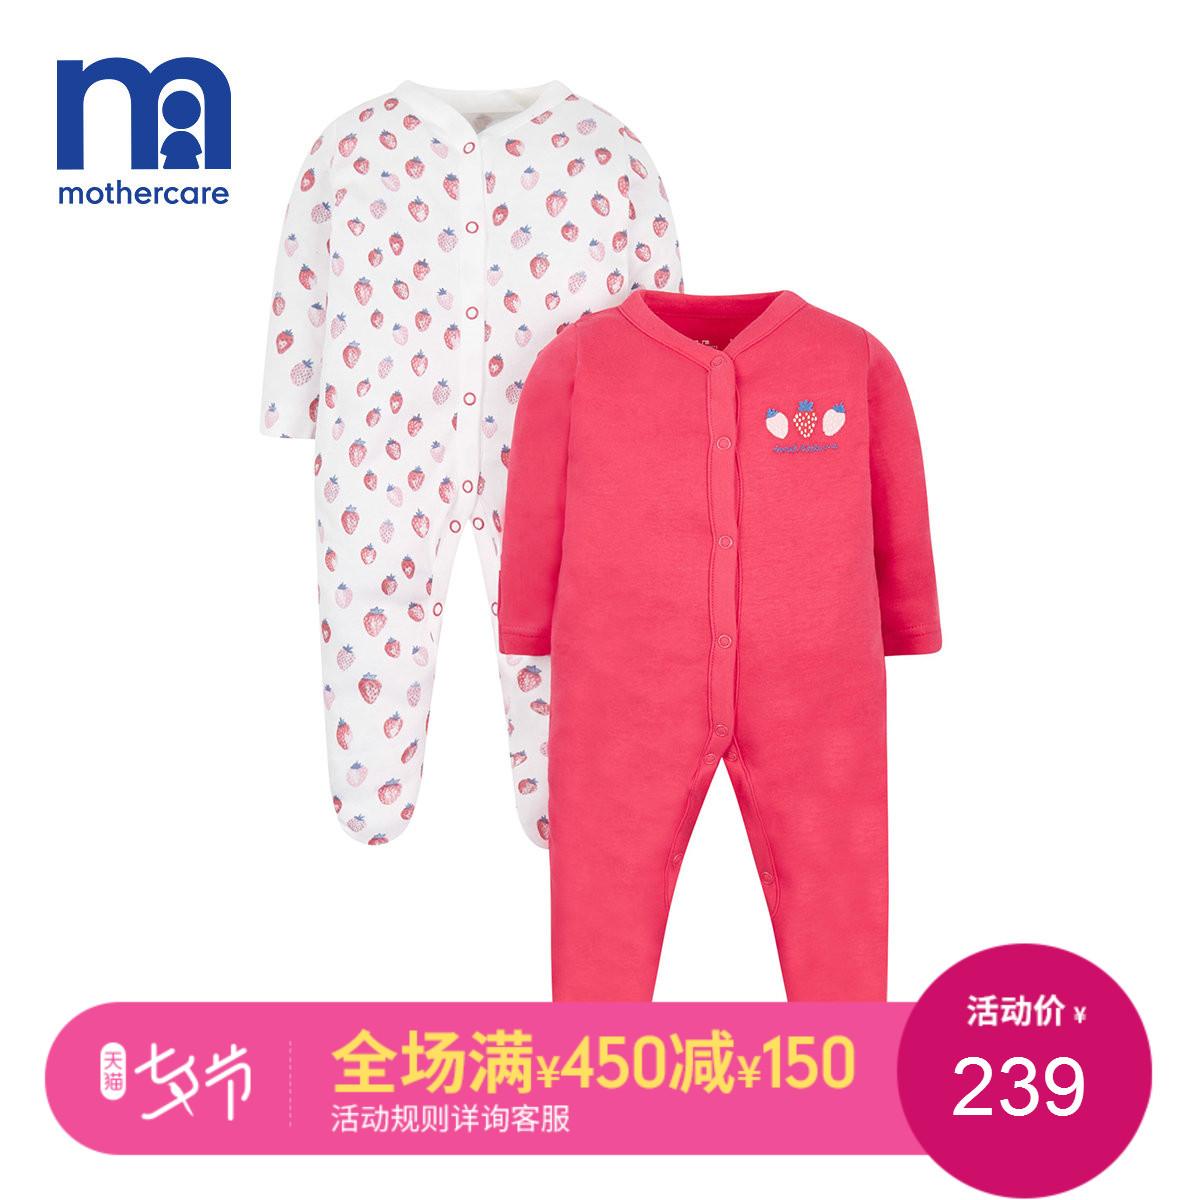 mothercare新生的儿宝宝衣服春季女婴儿棉质长袖甜美草莓图案哈衣